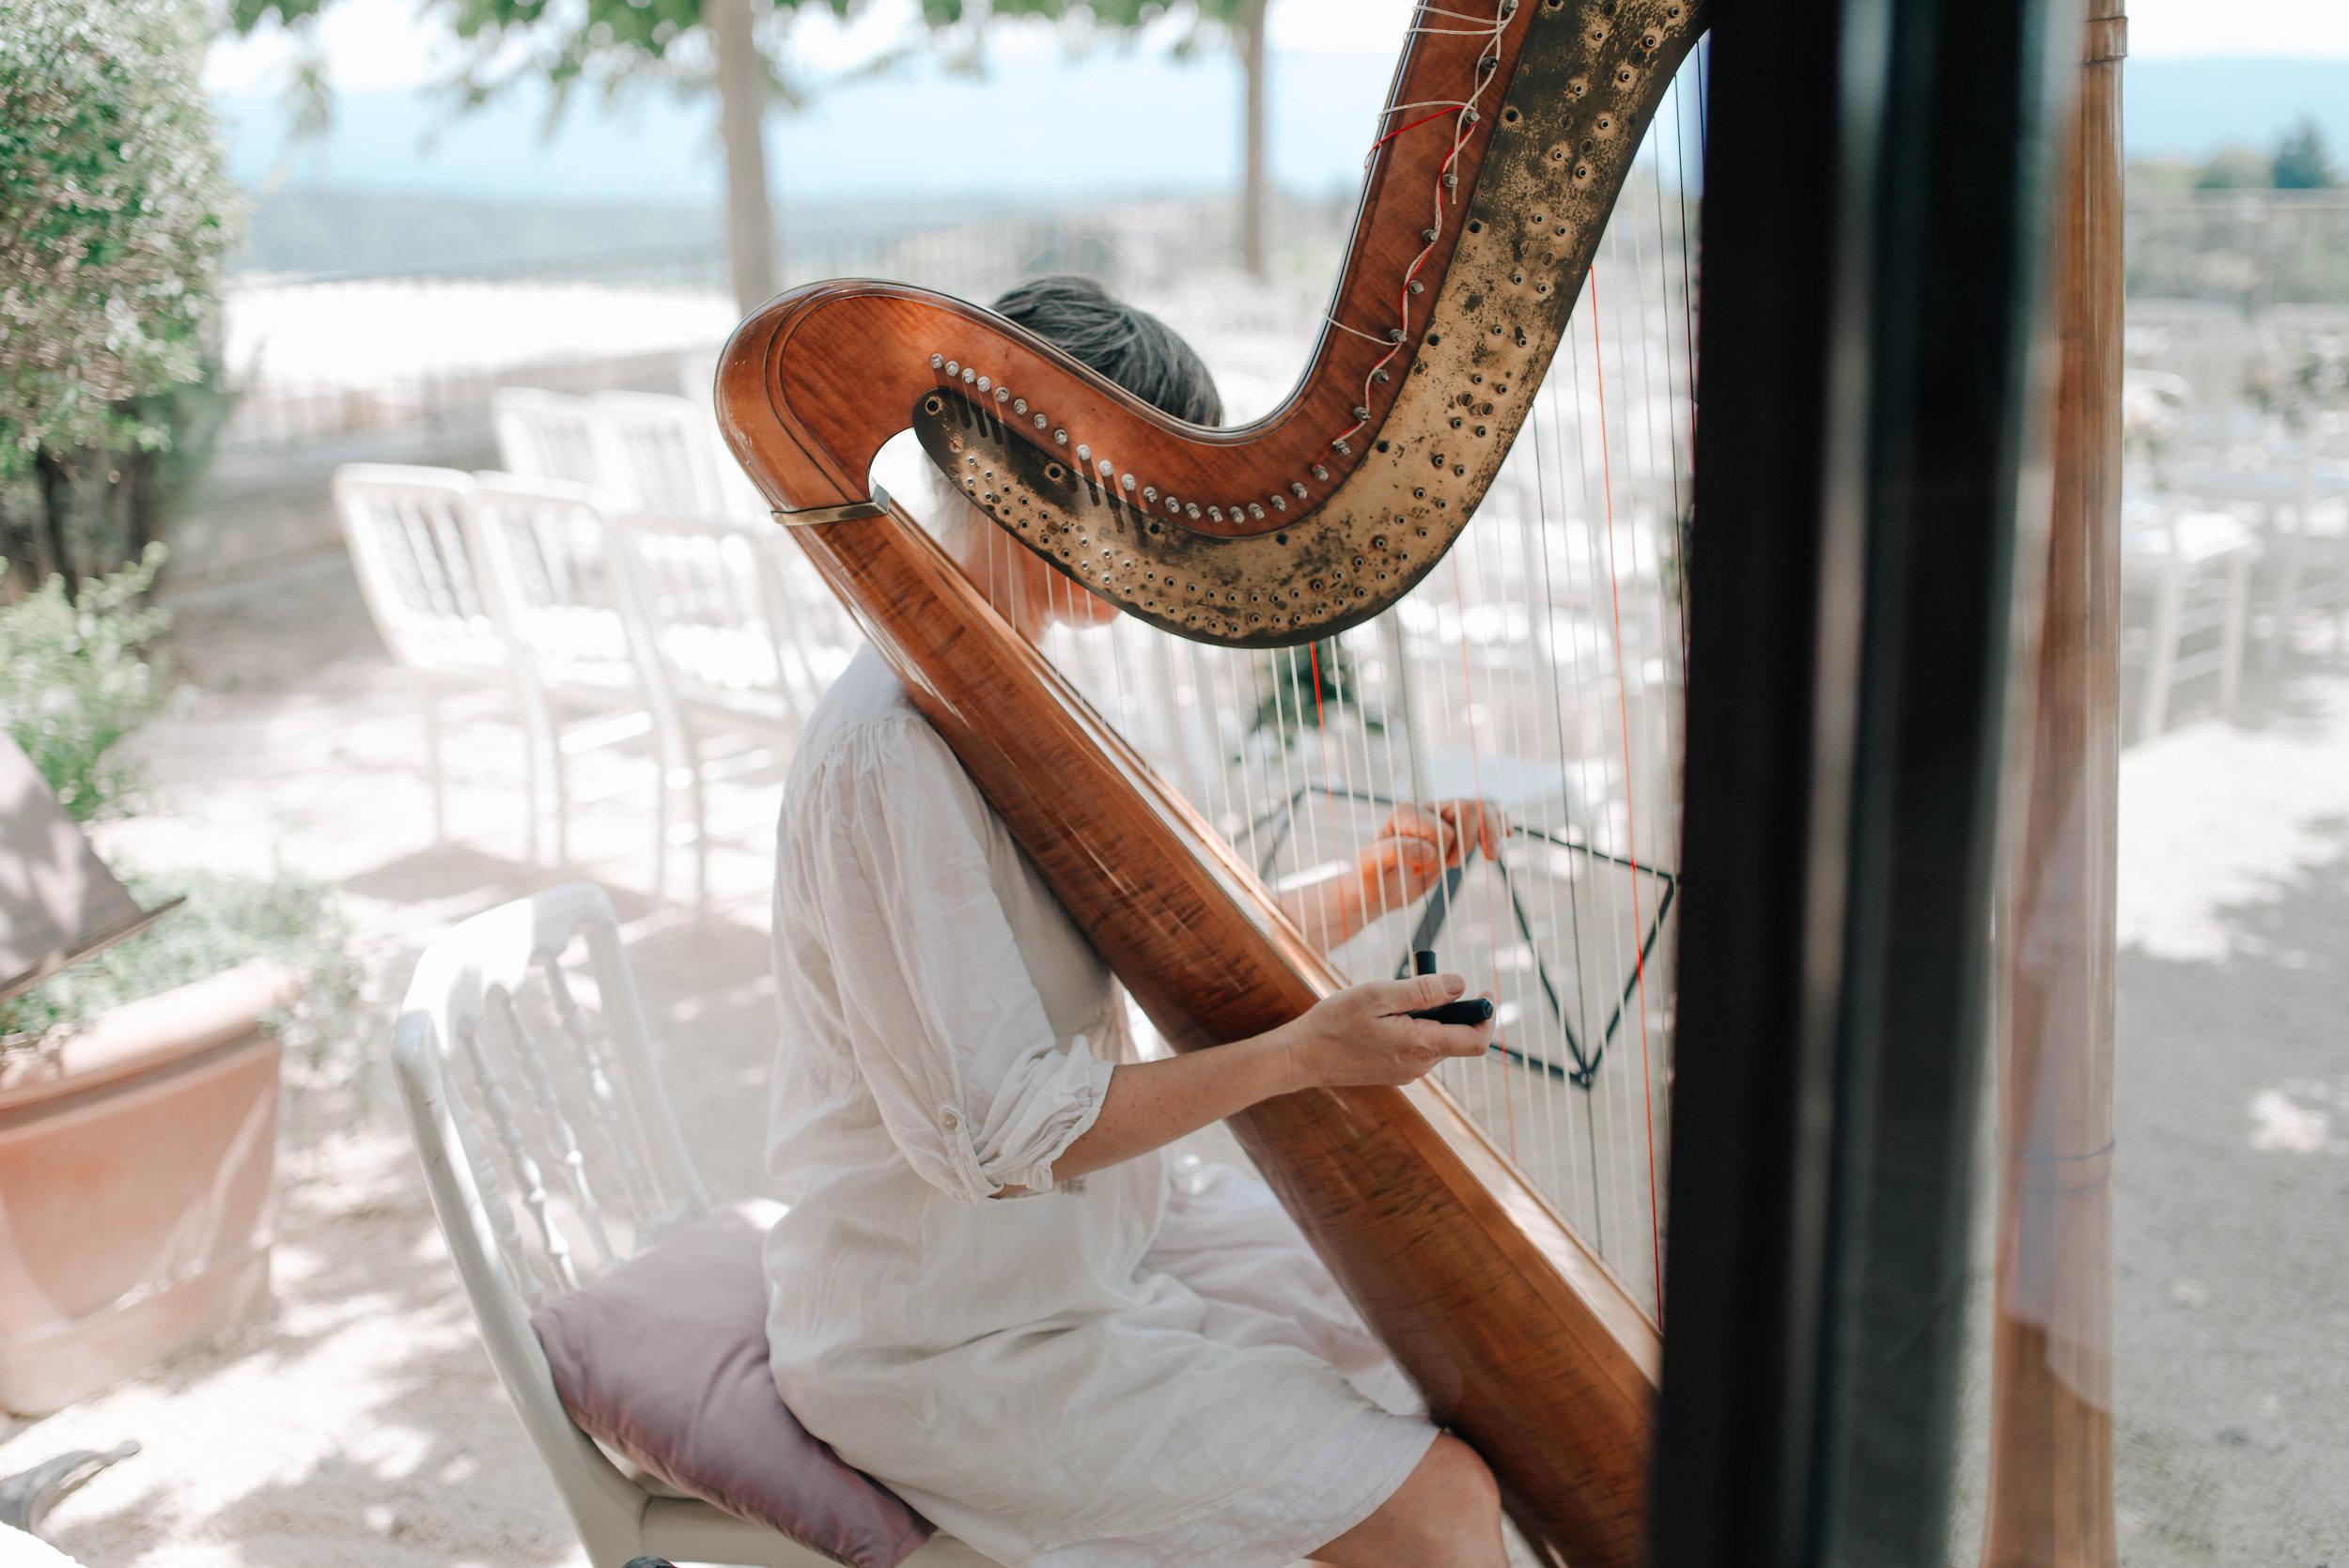 AmyChris_photographer Grace and Blush_harpist Mireille Bouvard .jpg